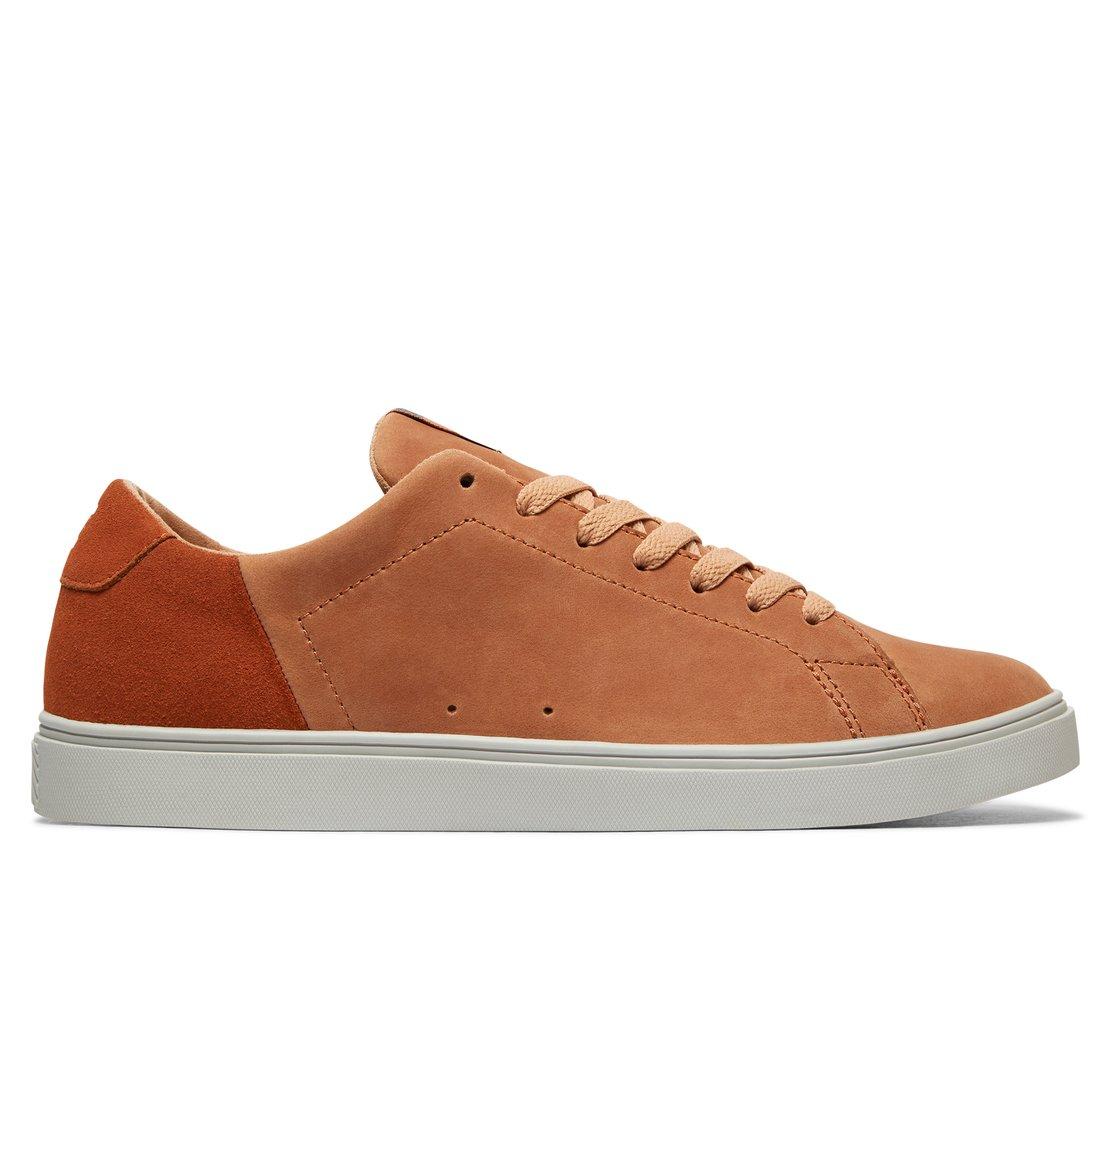 Chaussures DC Reprieve Se Caramel 22c 6NUMC